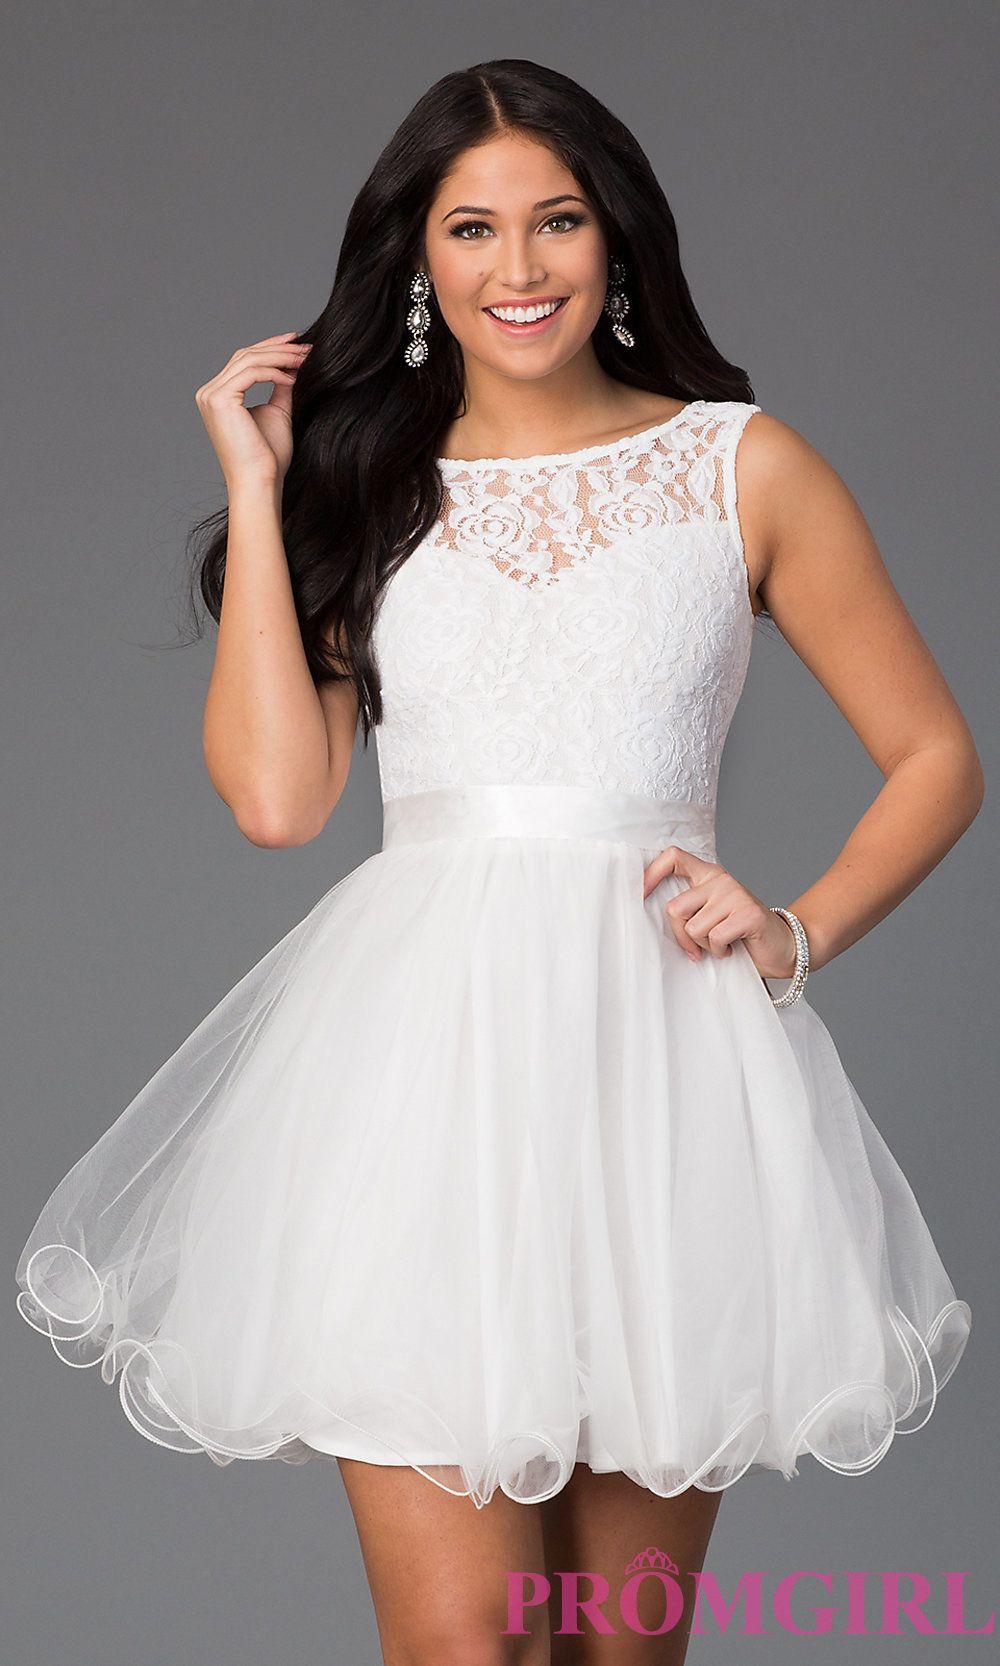 Beautiful Dress For Prom!  Dama dresses, Quinceanera dama dresses